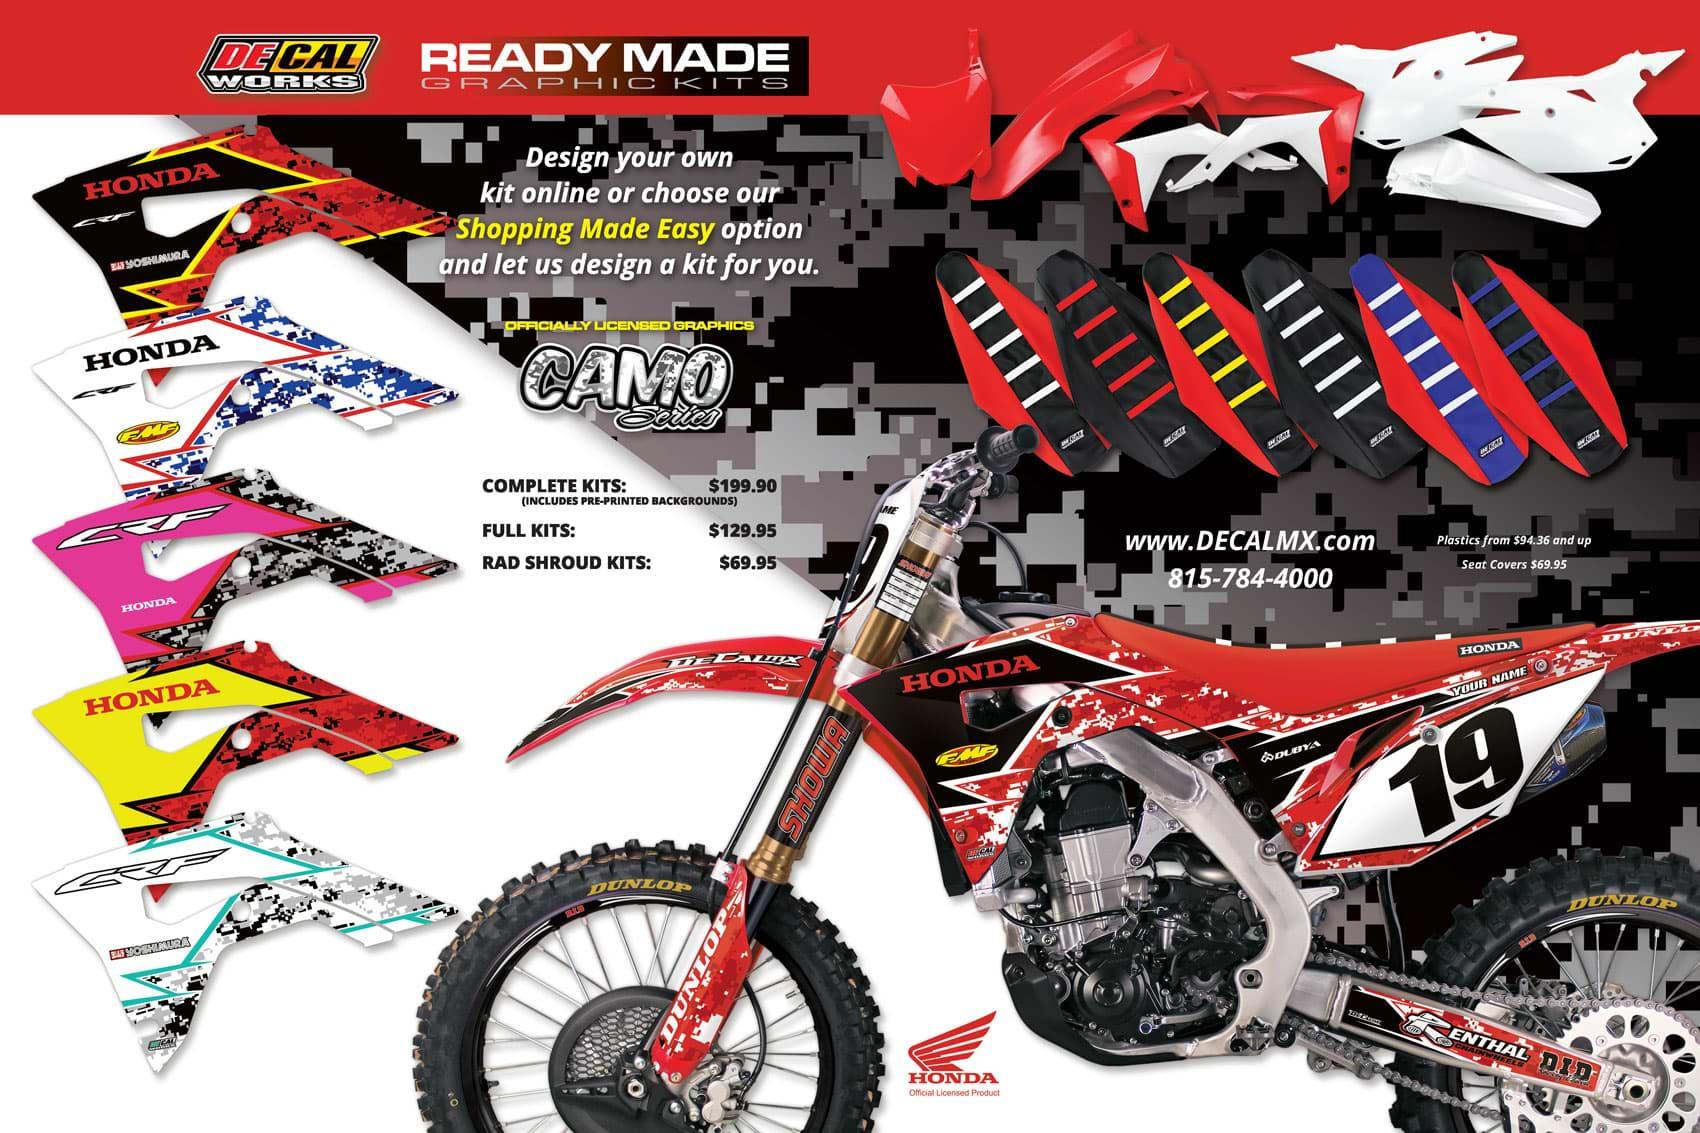 Racer X December 2019 - Decal Works Advertisement